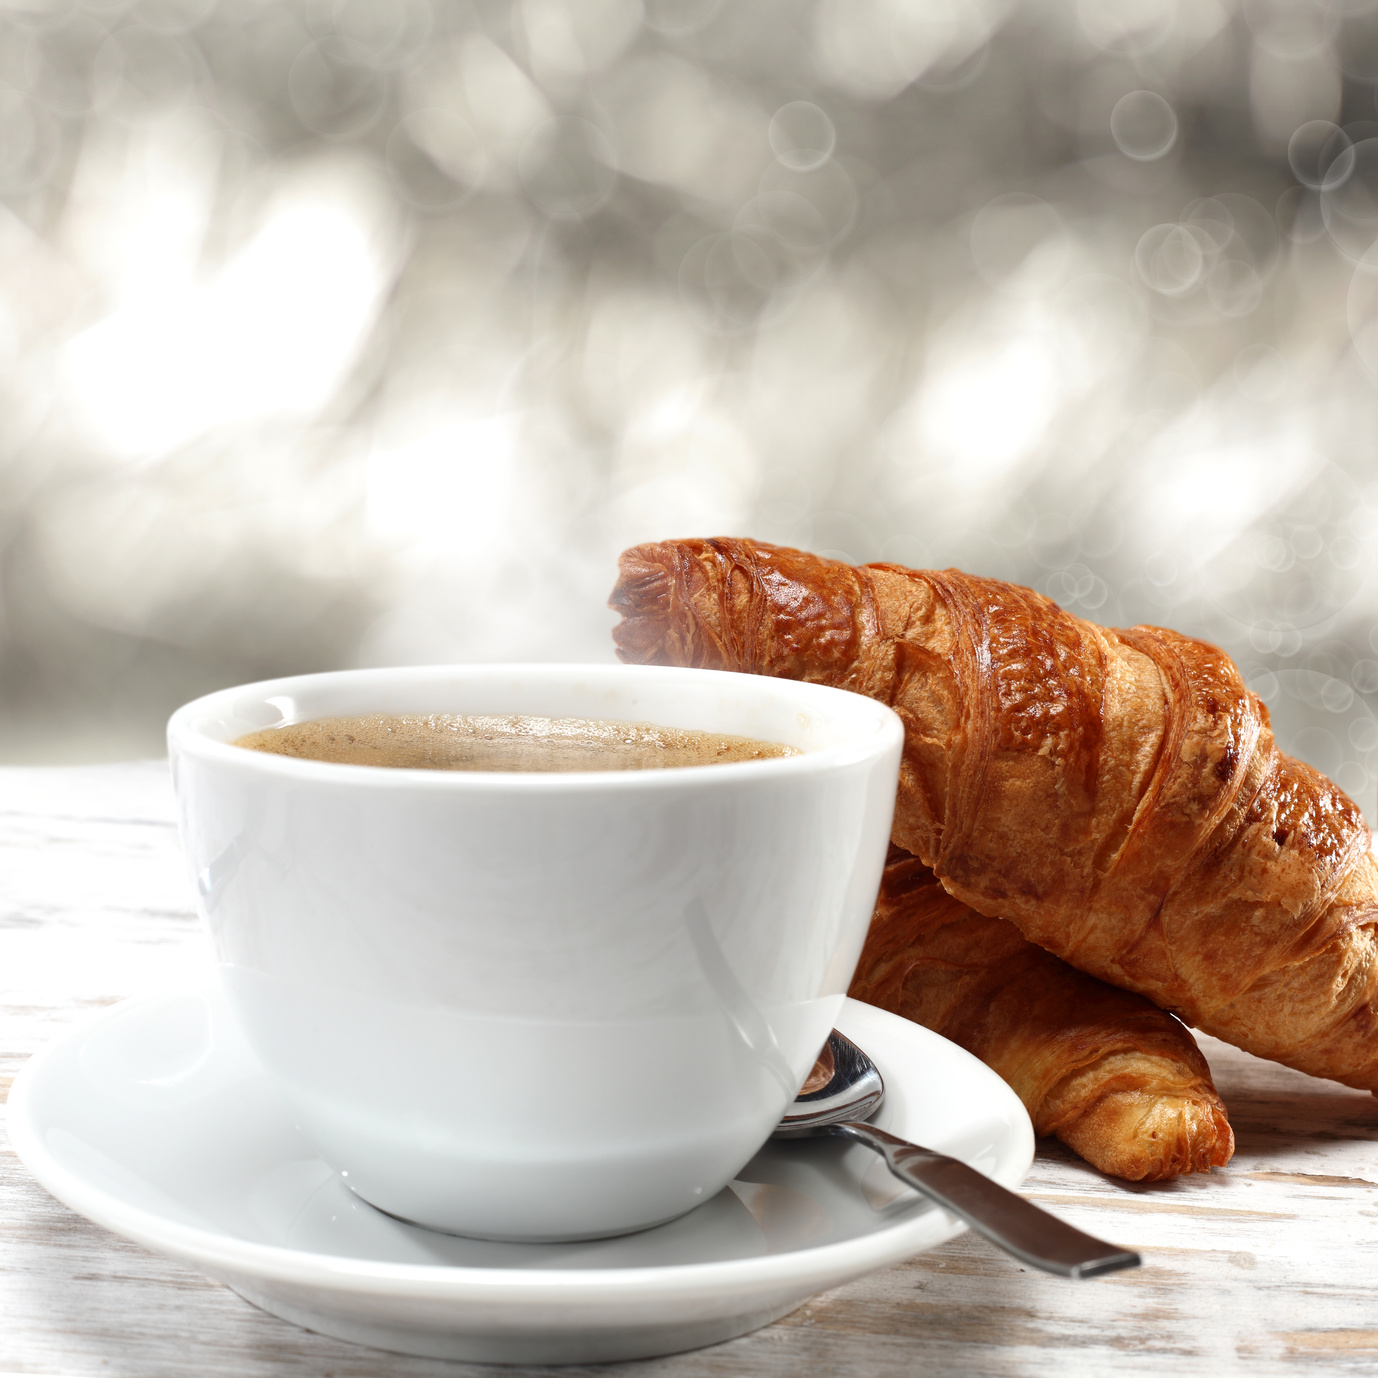 20131024-Afbeelding-Koffie